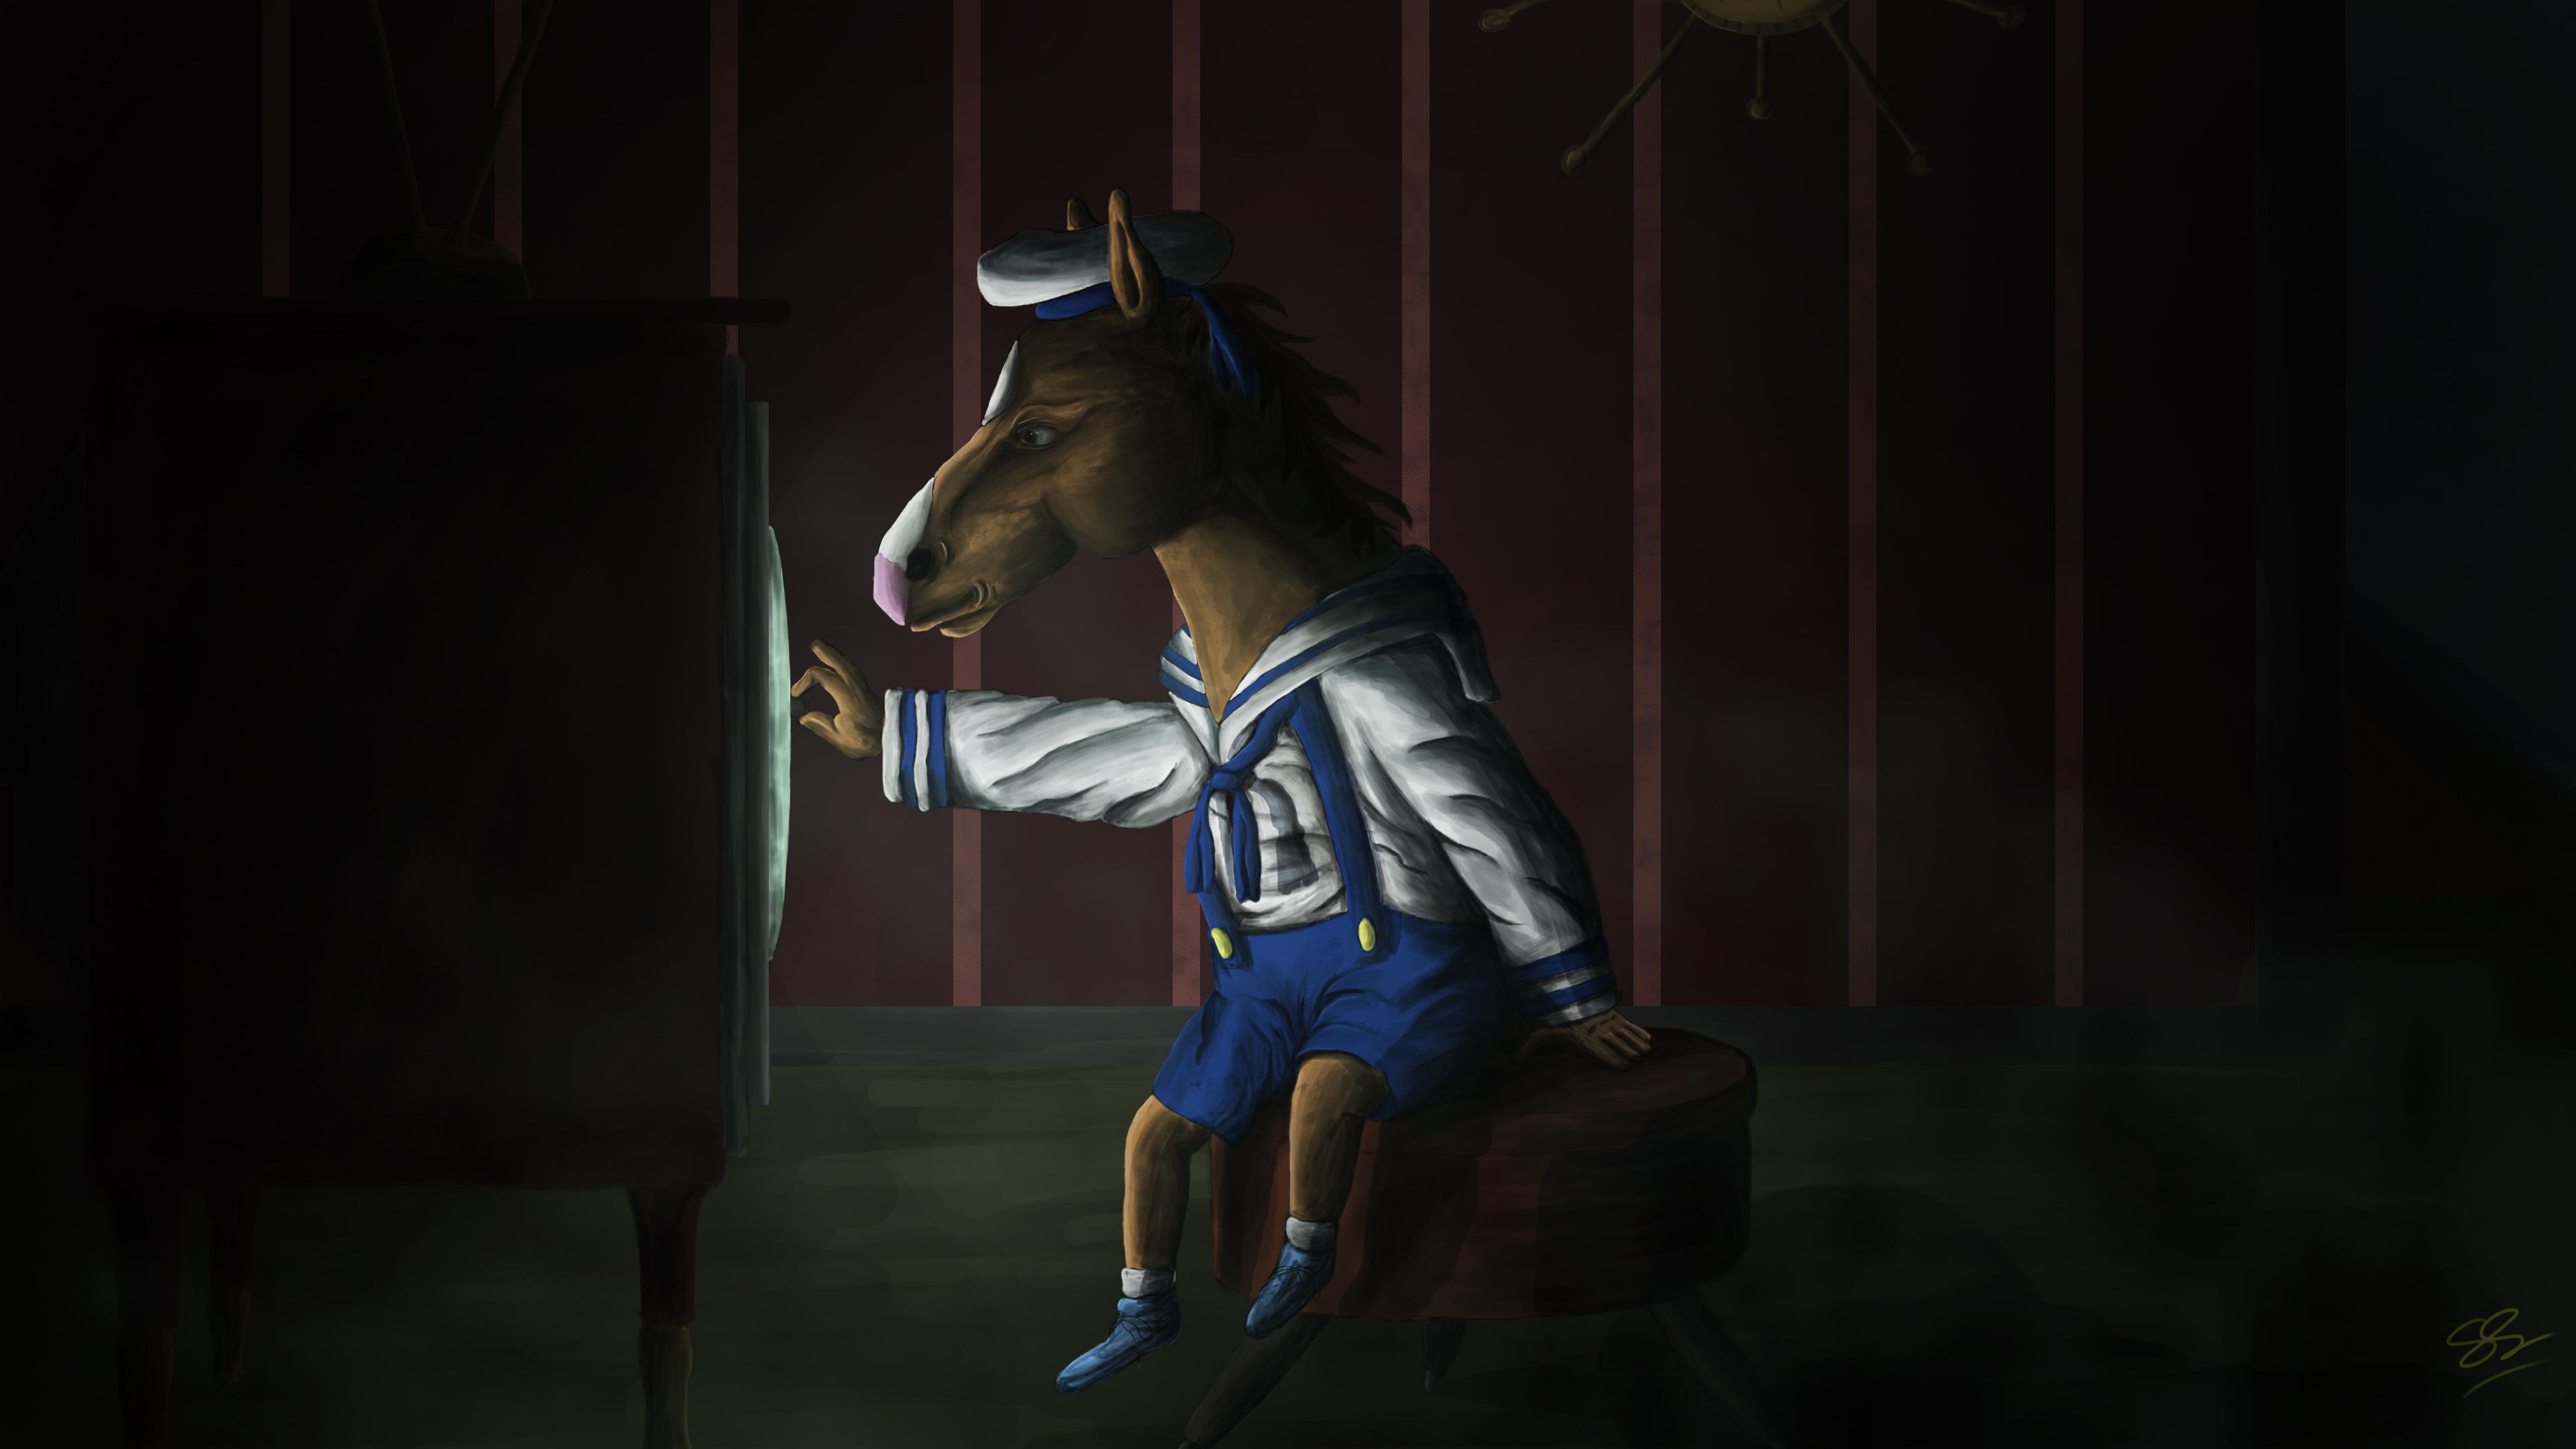 Bojack Horseman 4k Hd Tv Shows 4k Wallpapers Images